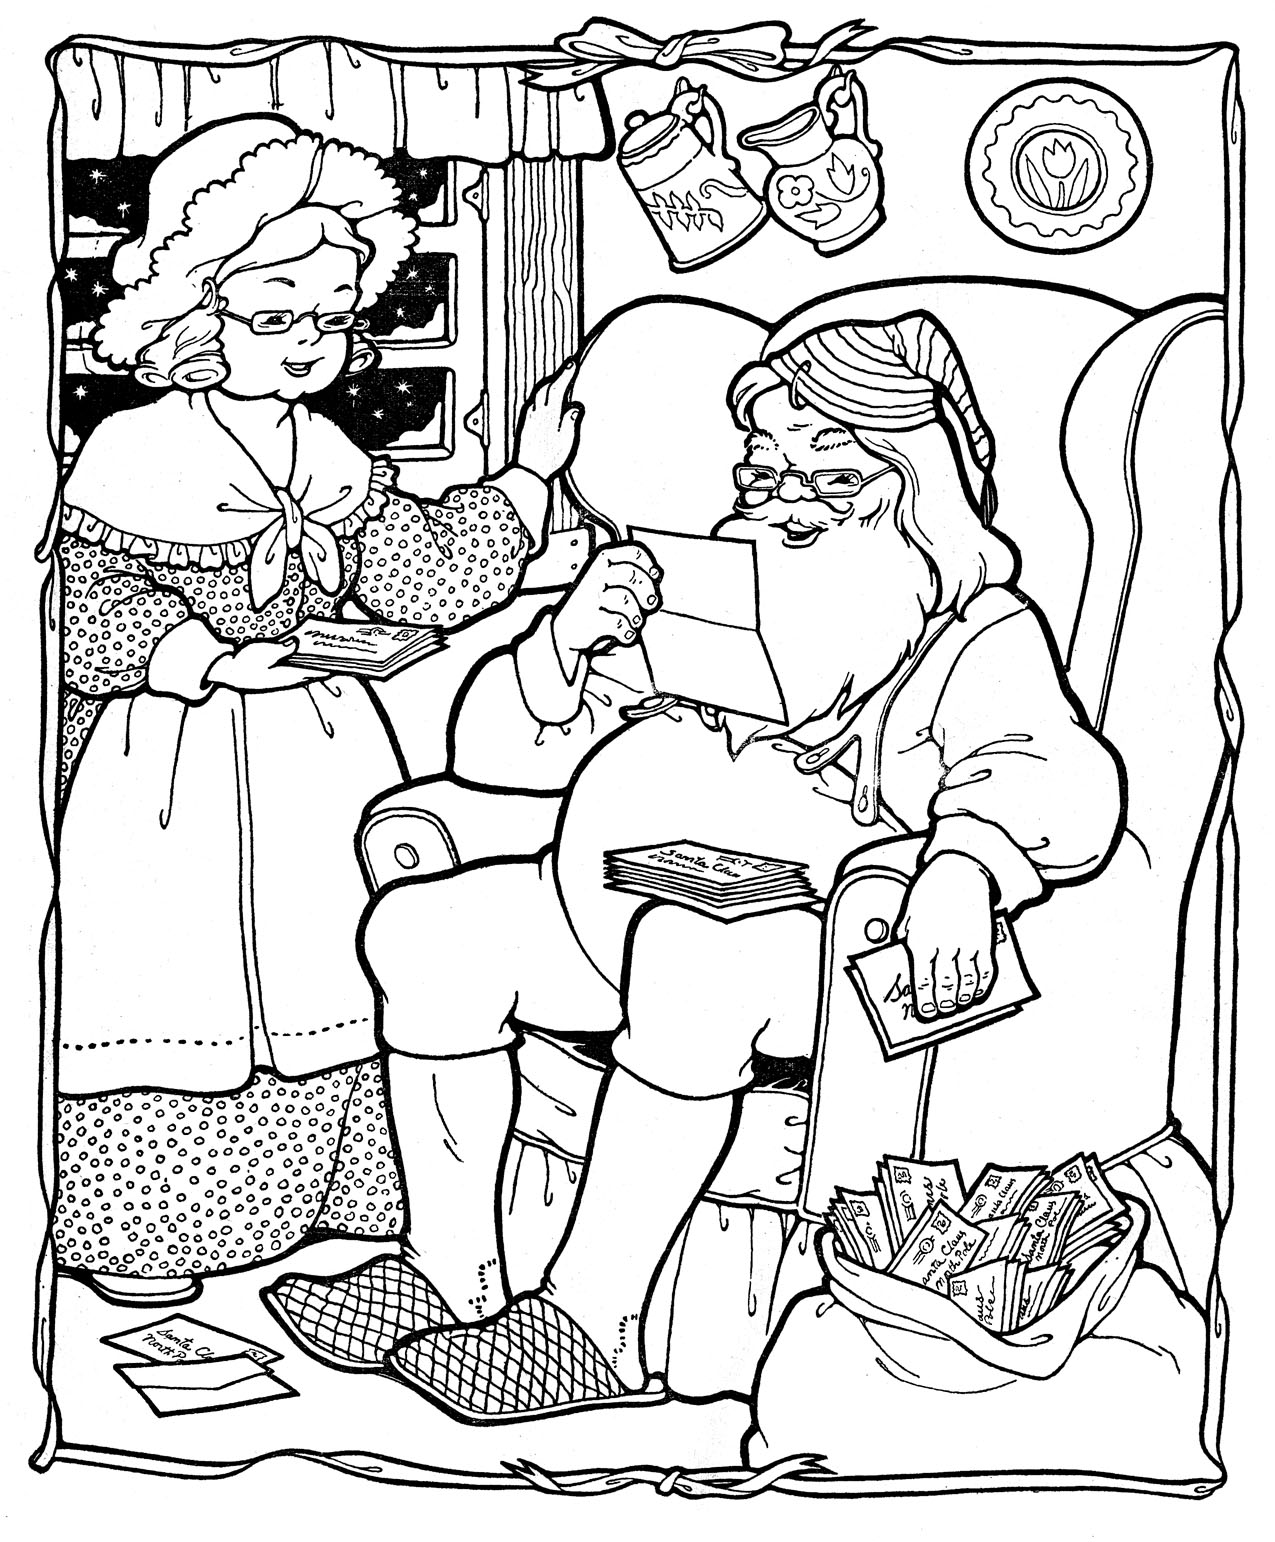 Santa Coloring Pages (26) Coloring Kids - Coloring Kids